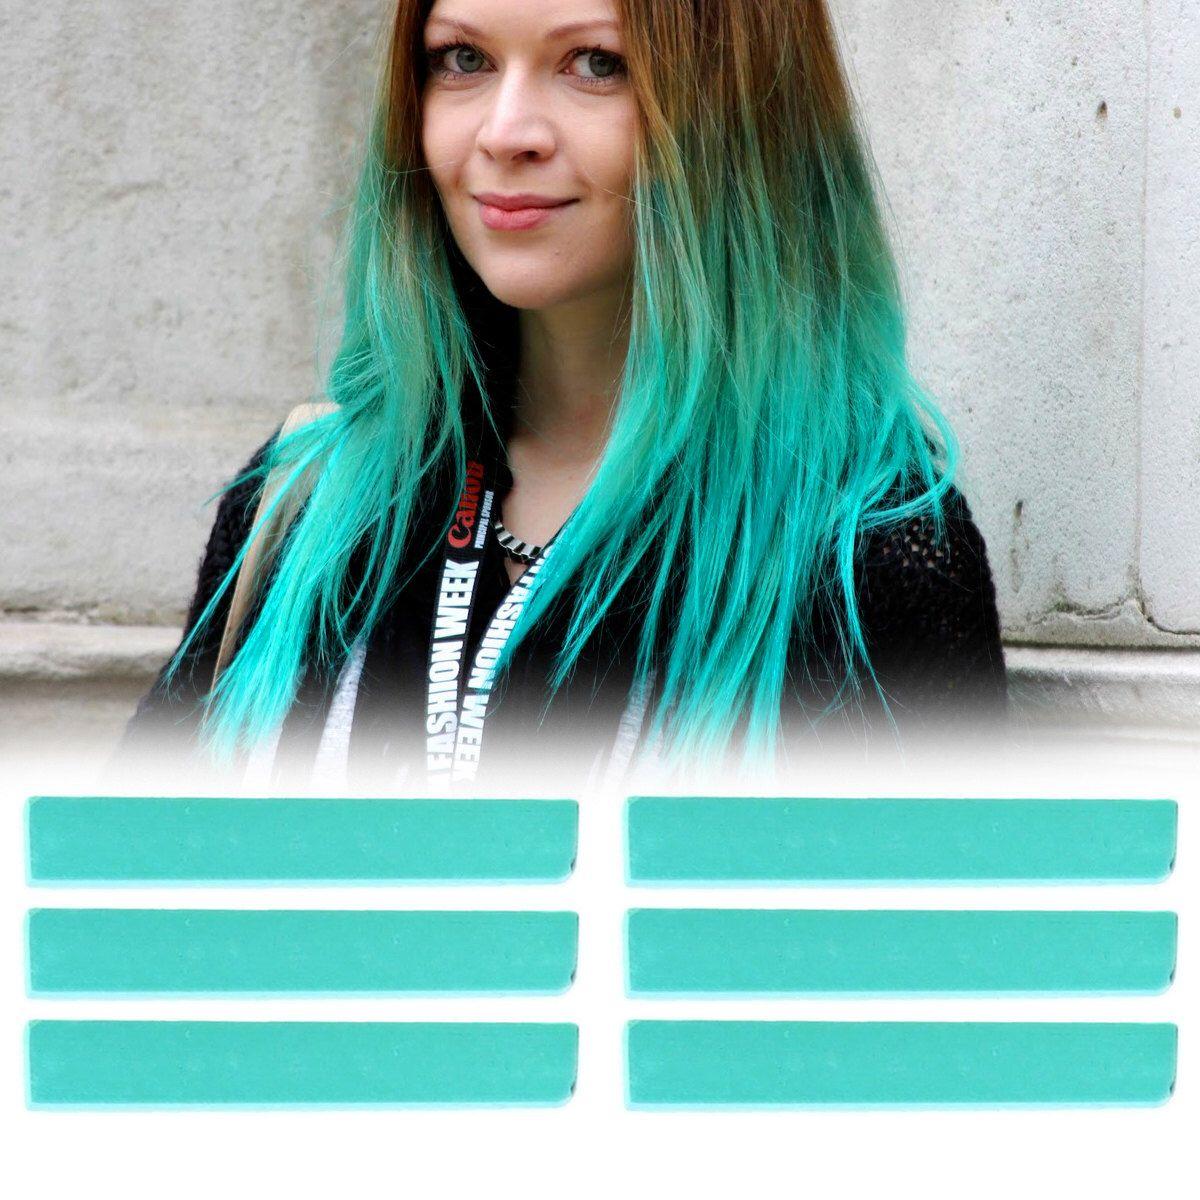 6 Best Temporary Mint Teal hair Dye for dark and light hair - Set ...